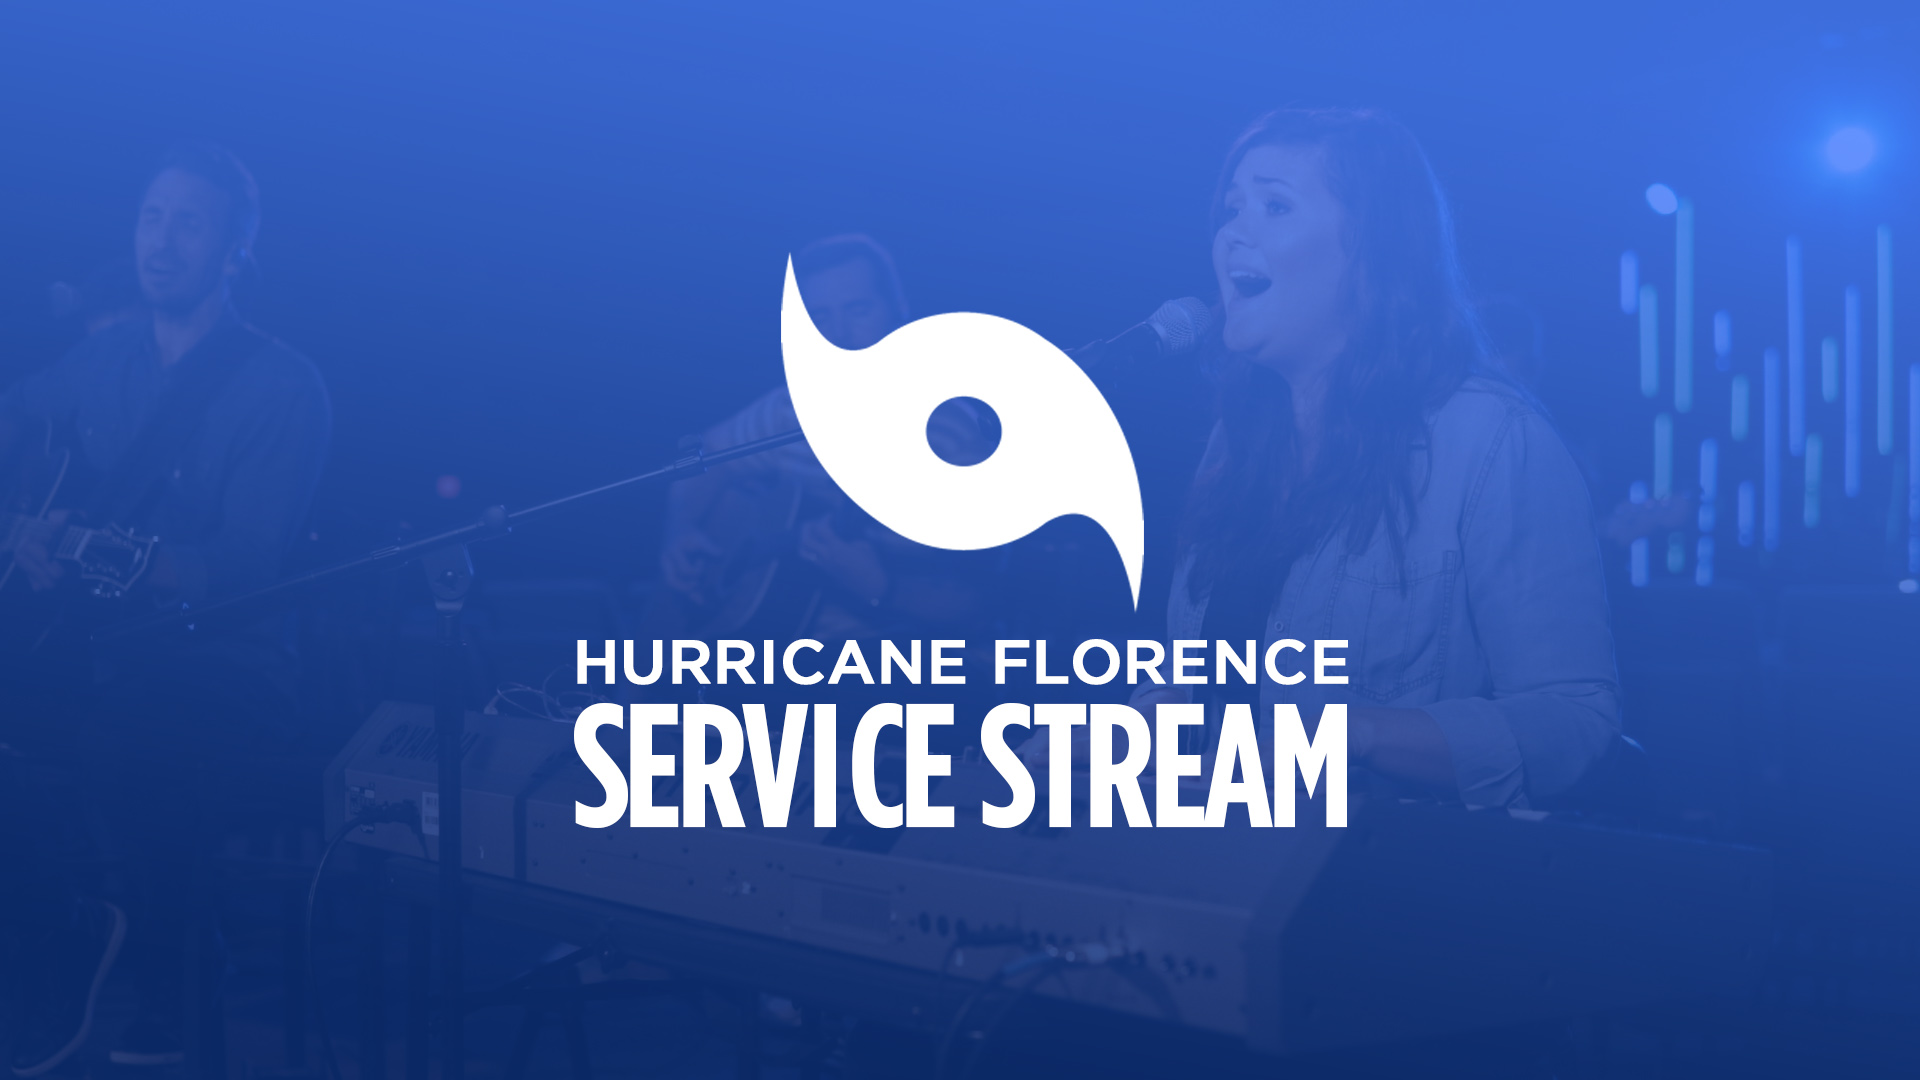 Hurricane Florence (Service Stream)